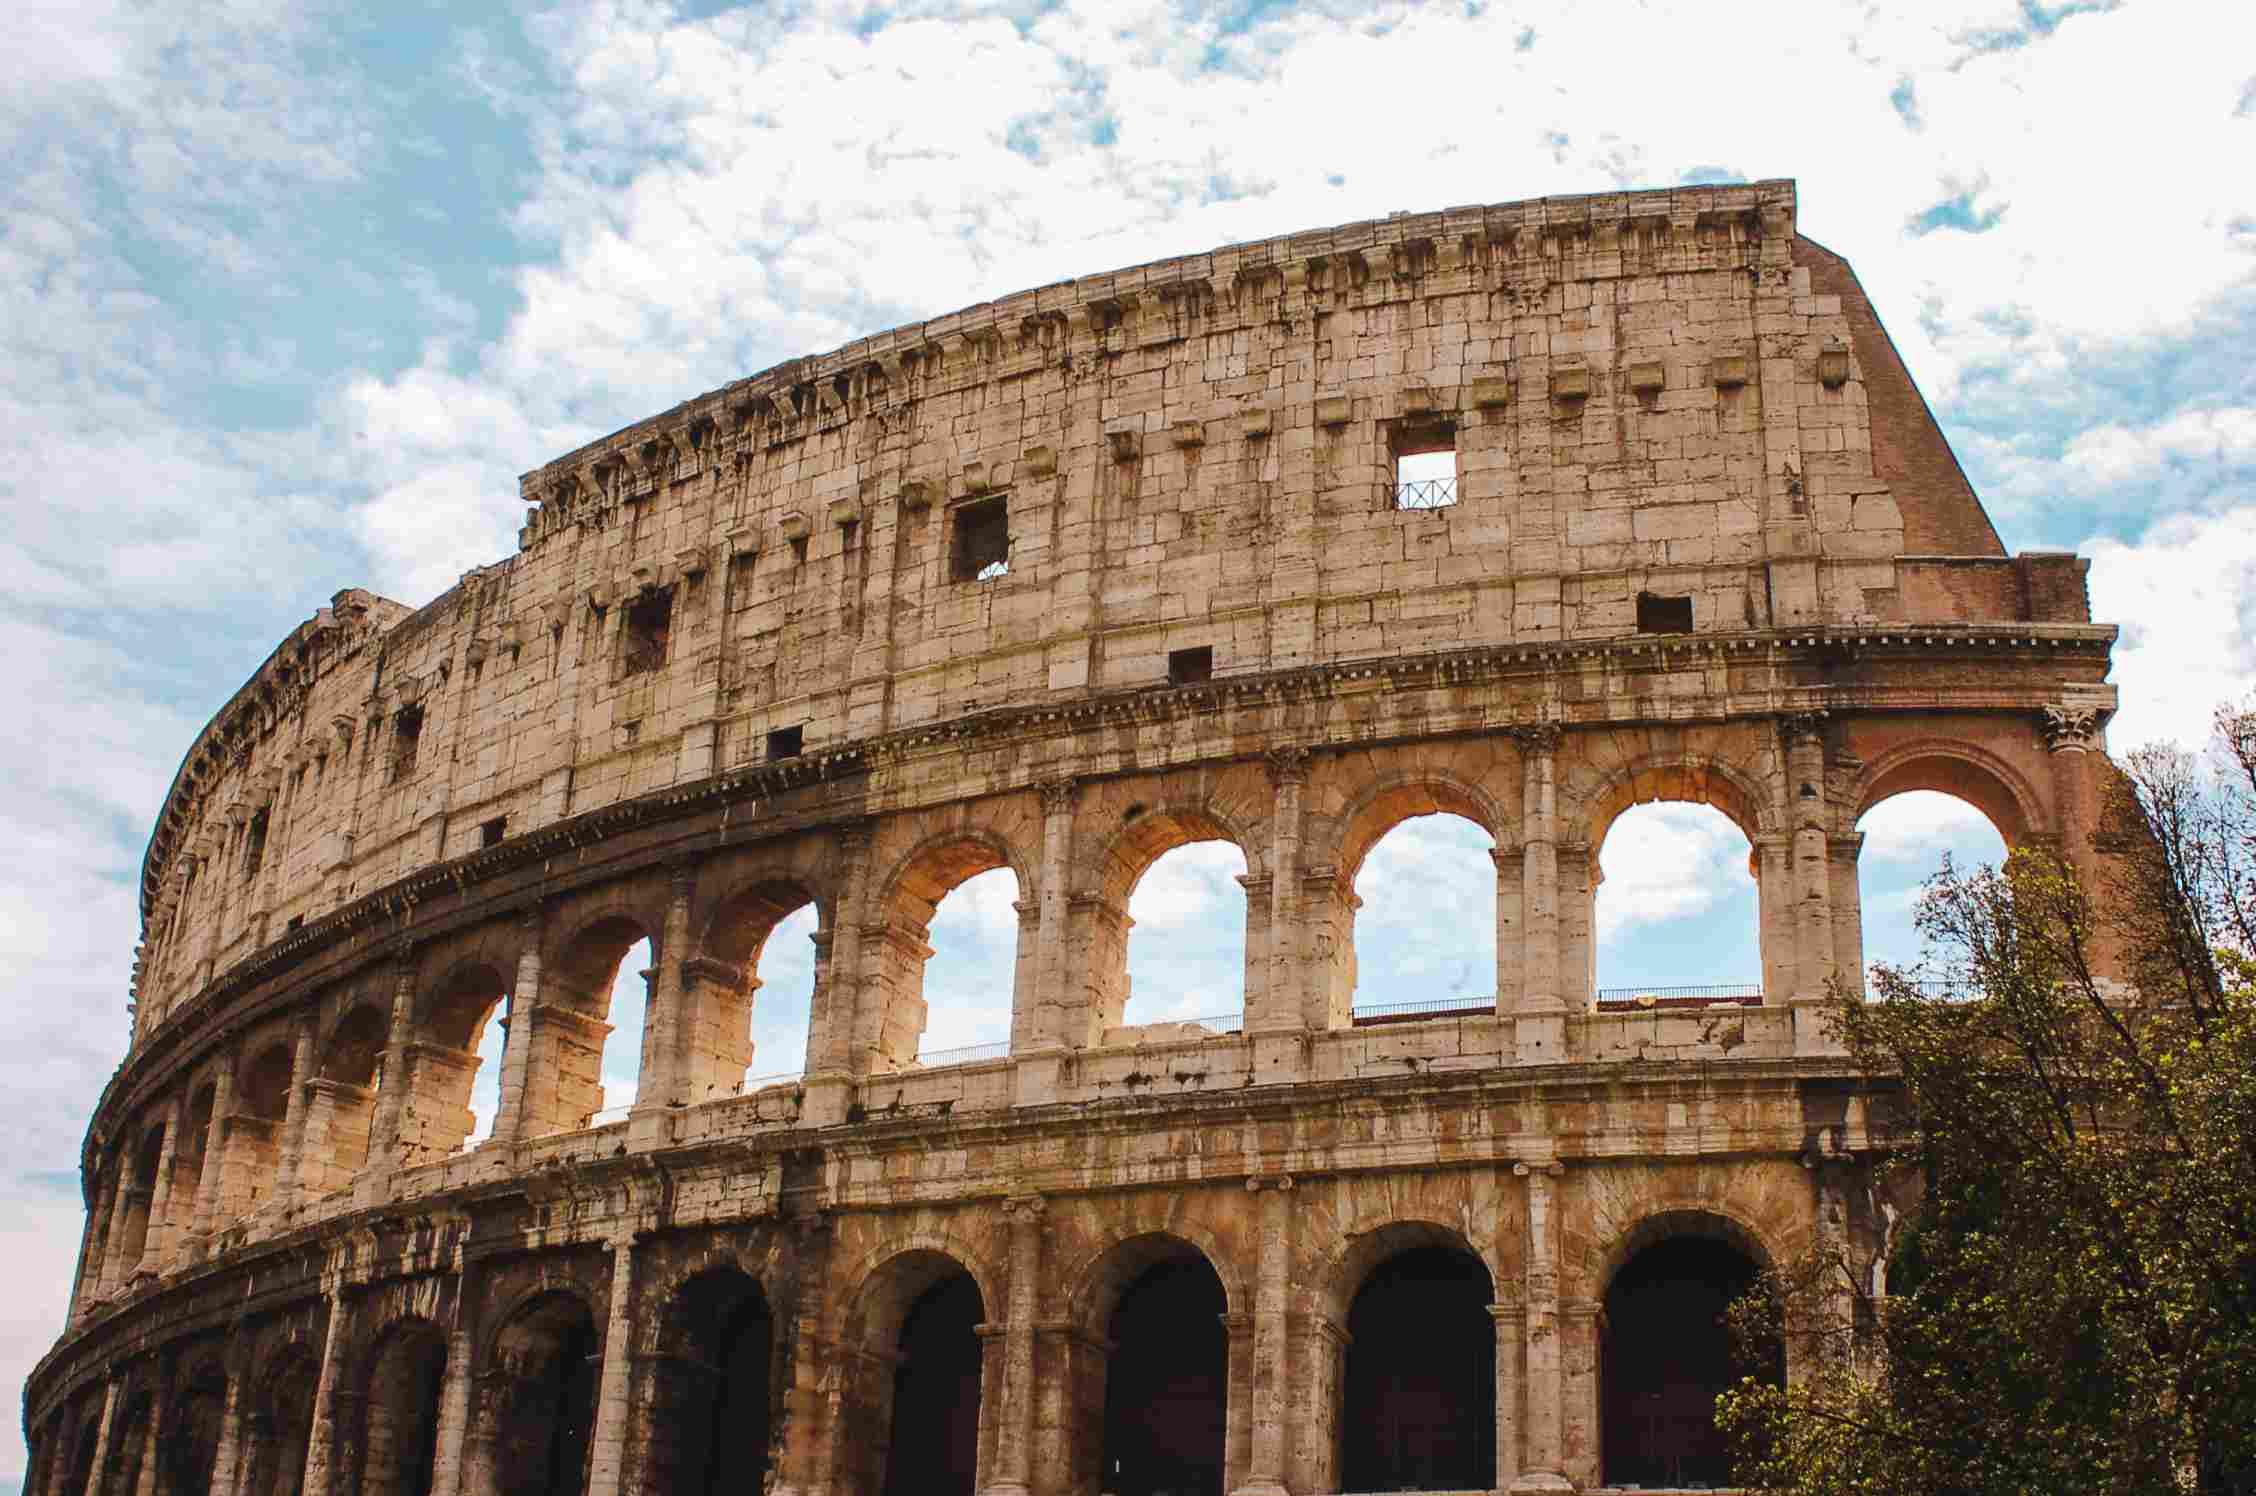 El exterior del Coliseo Romano